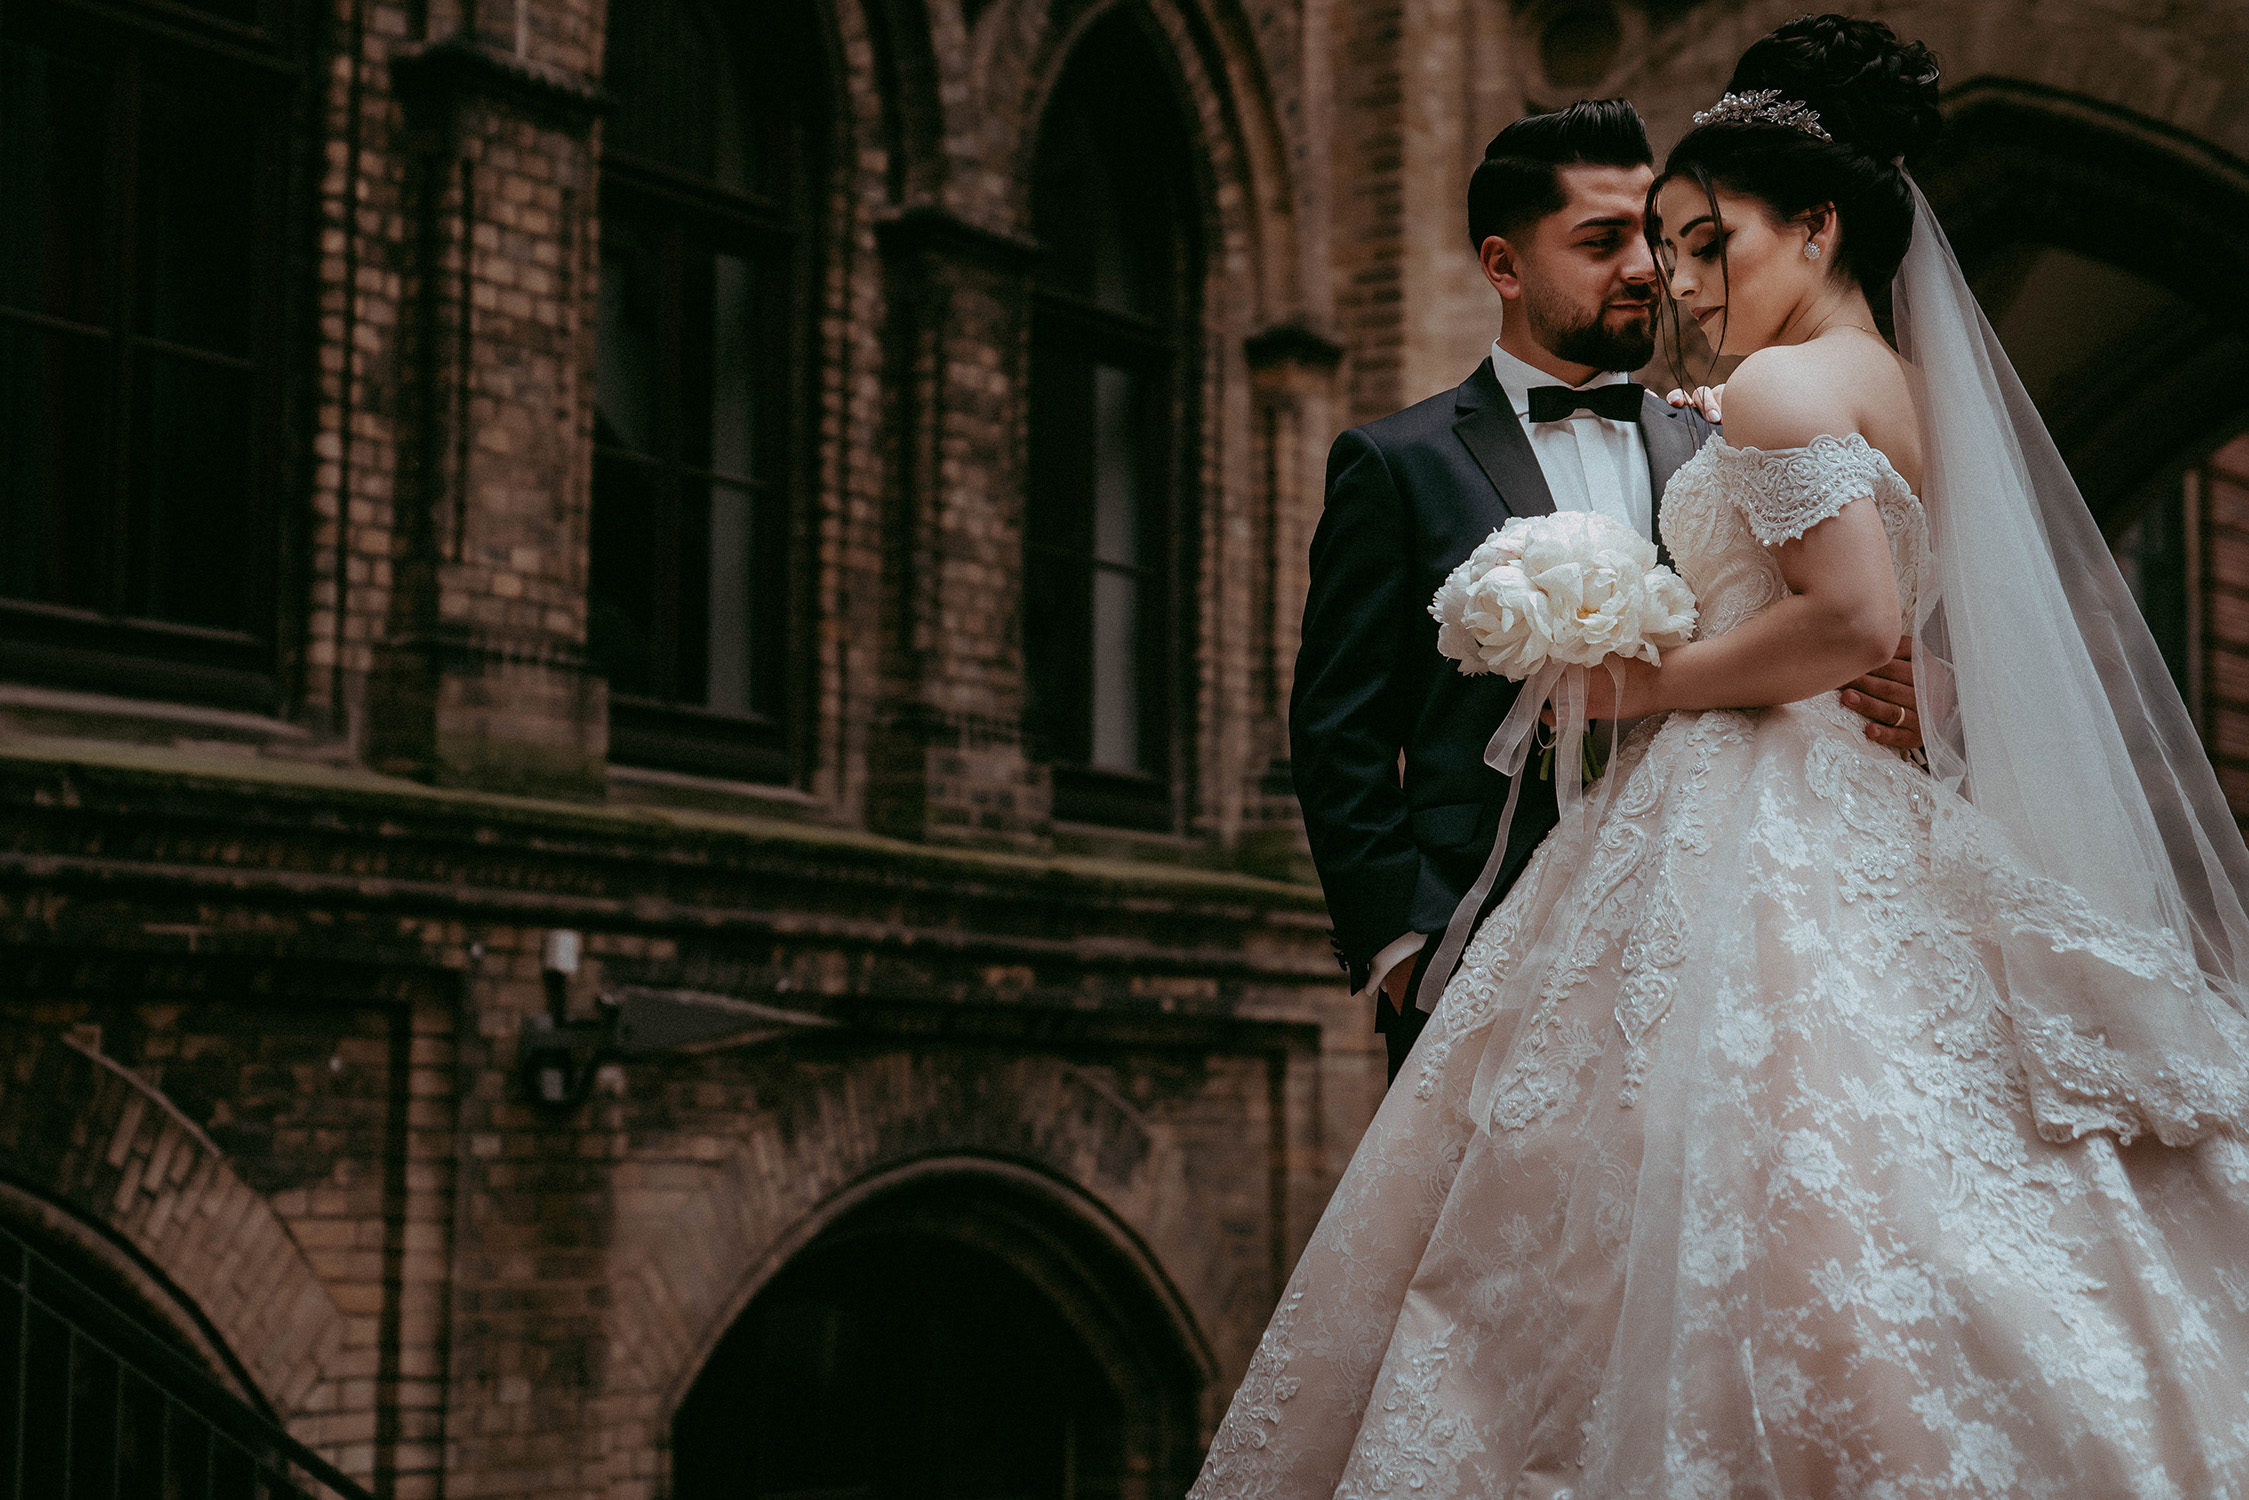 Das Brautpaar Umarmung.jpg